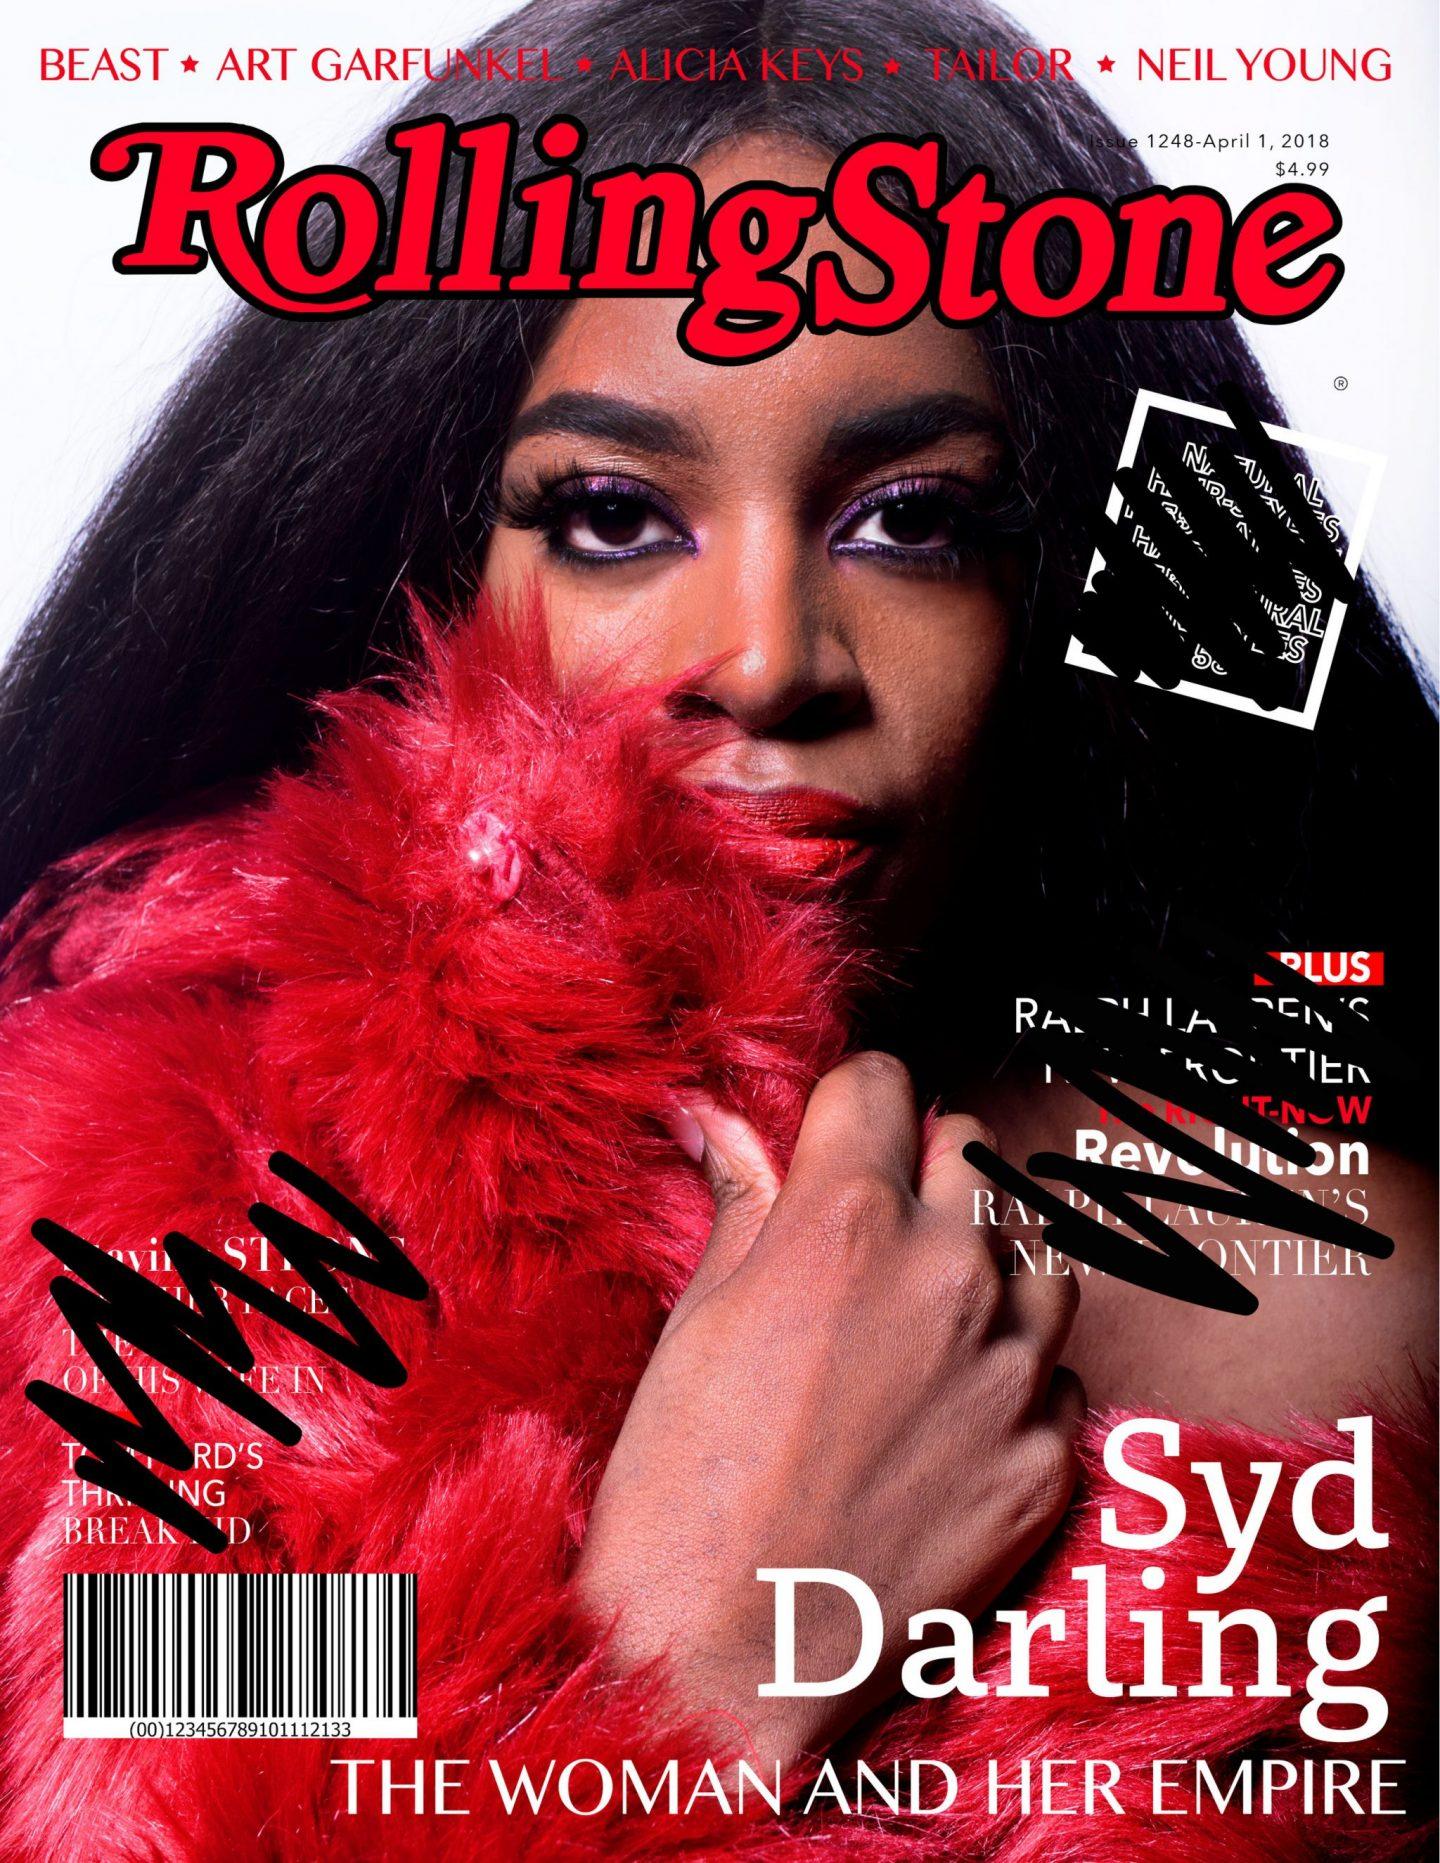 sydnei_jarman_rolling_stone